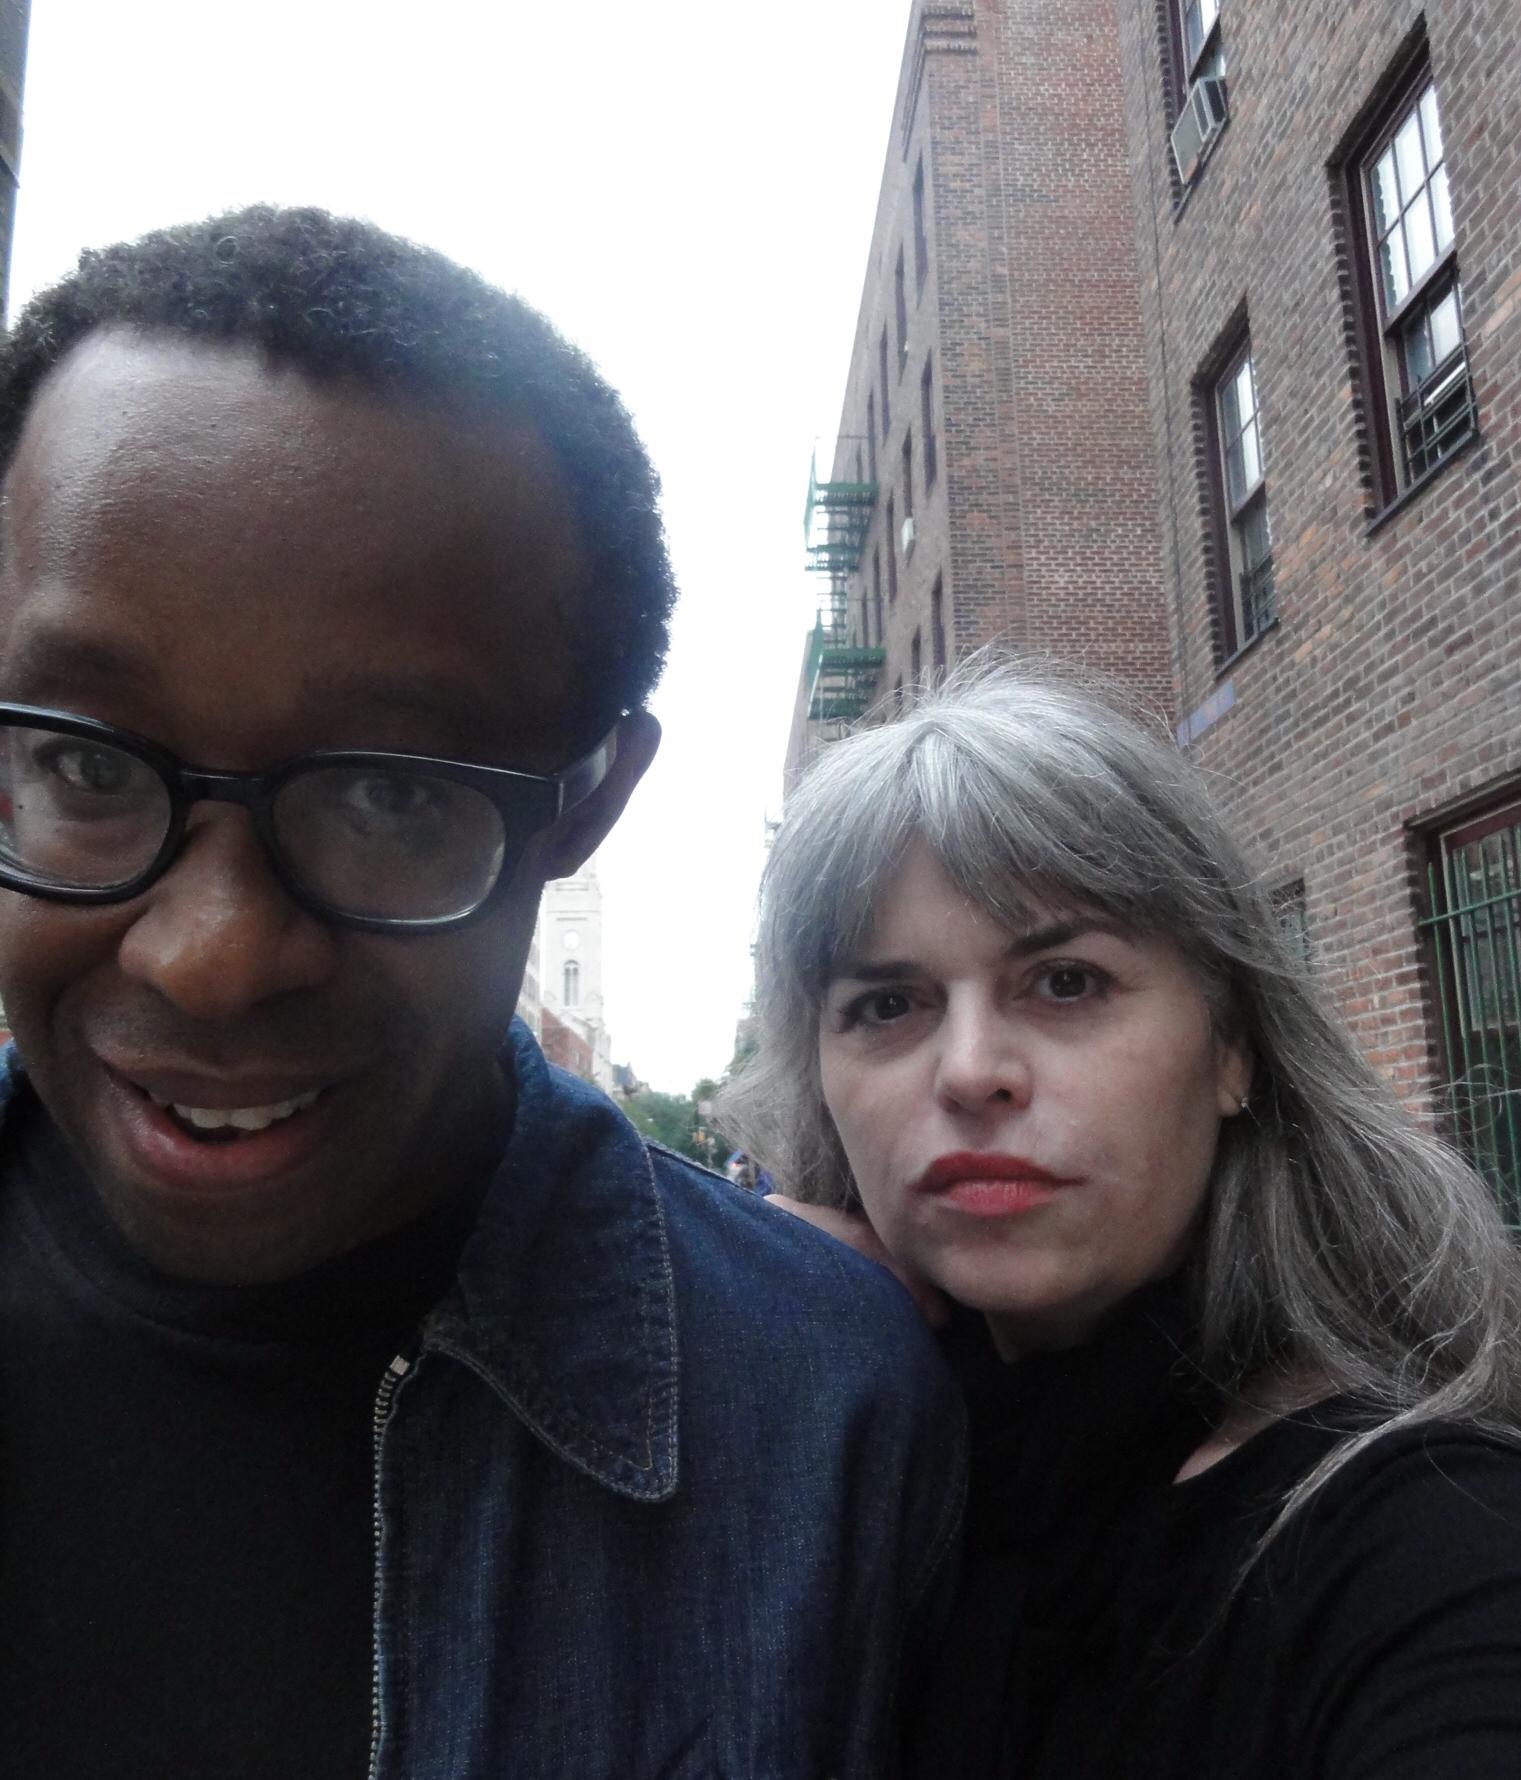 Matthew Shipp and Barbara Januszkiewicz, Moxievision